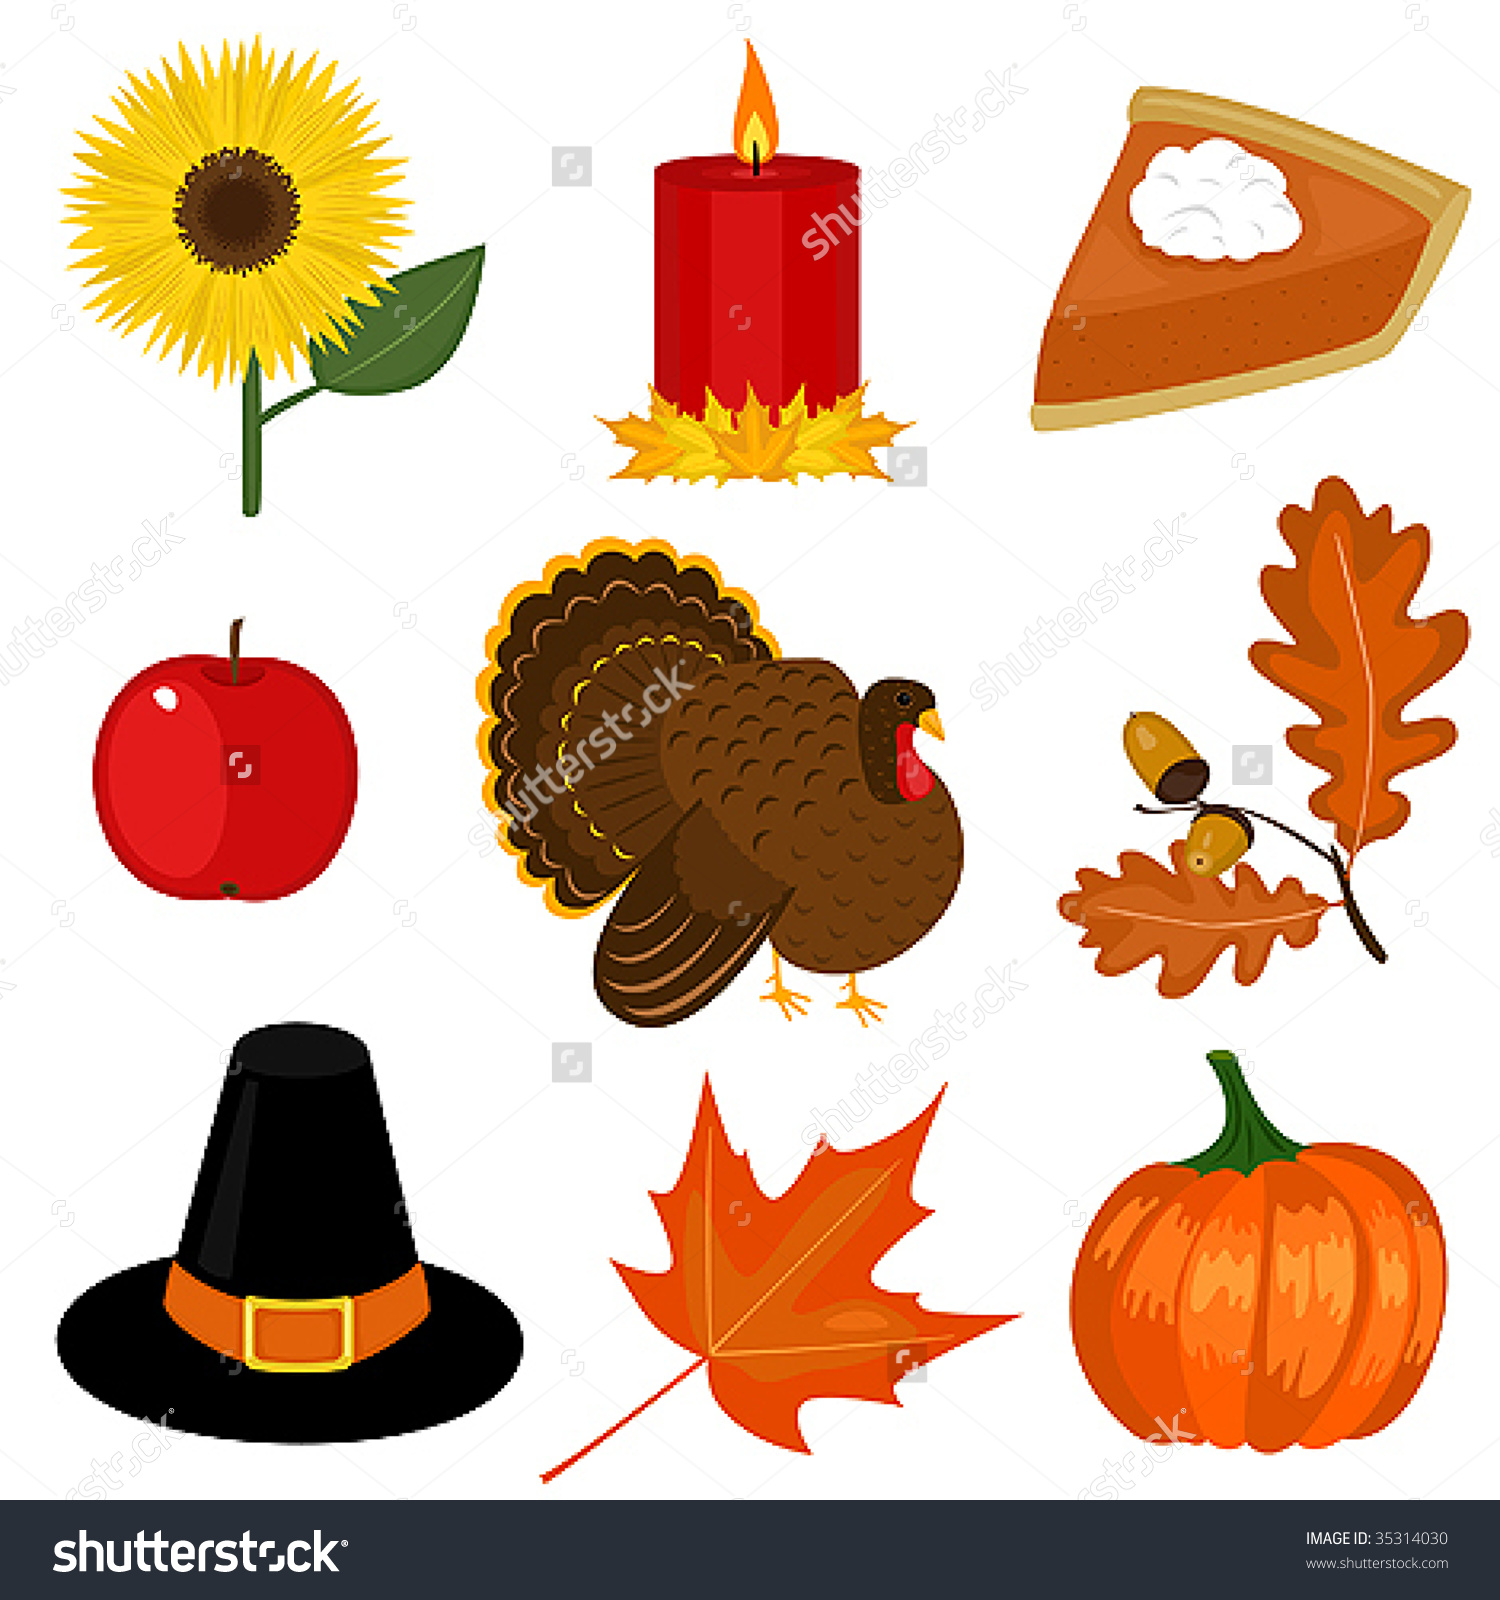 Thanksgiving Day Clip-Art Stock Vector I-Thanksgiving Day Clip-Art Stock Vector Illustration 35314030 : Shutterstock-6